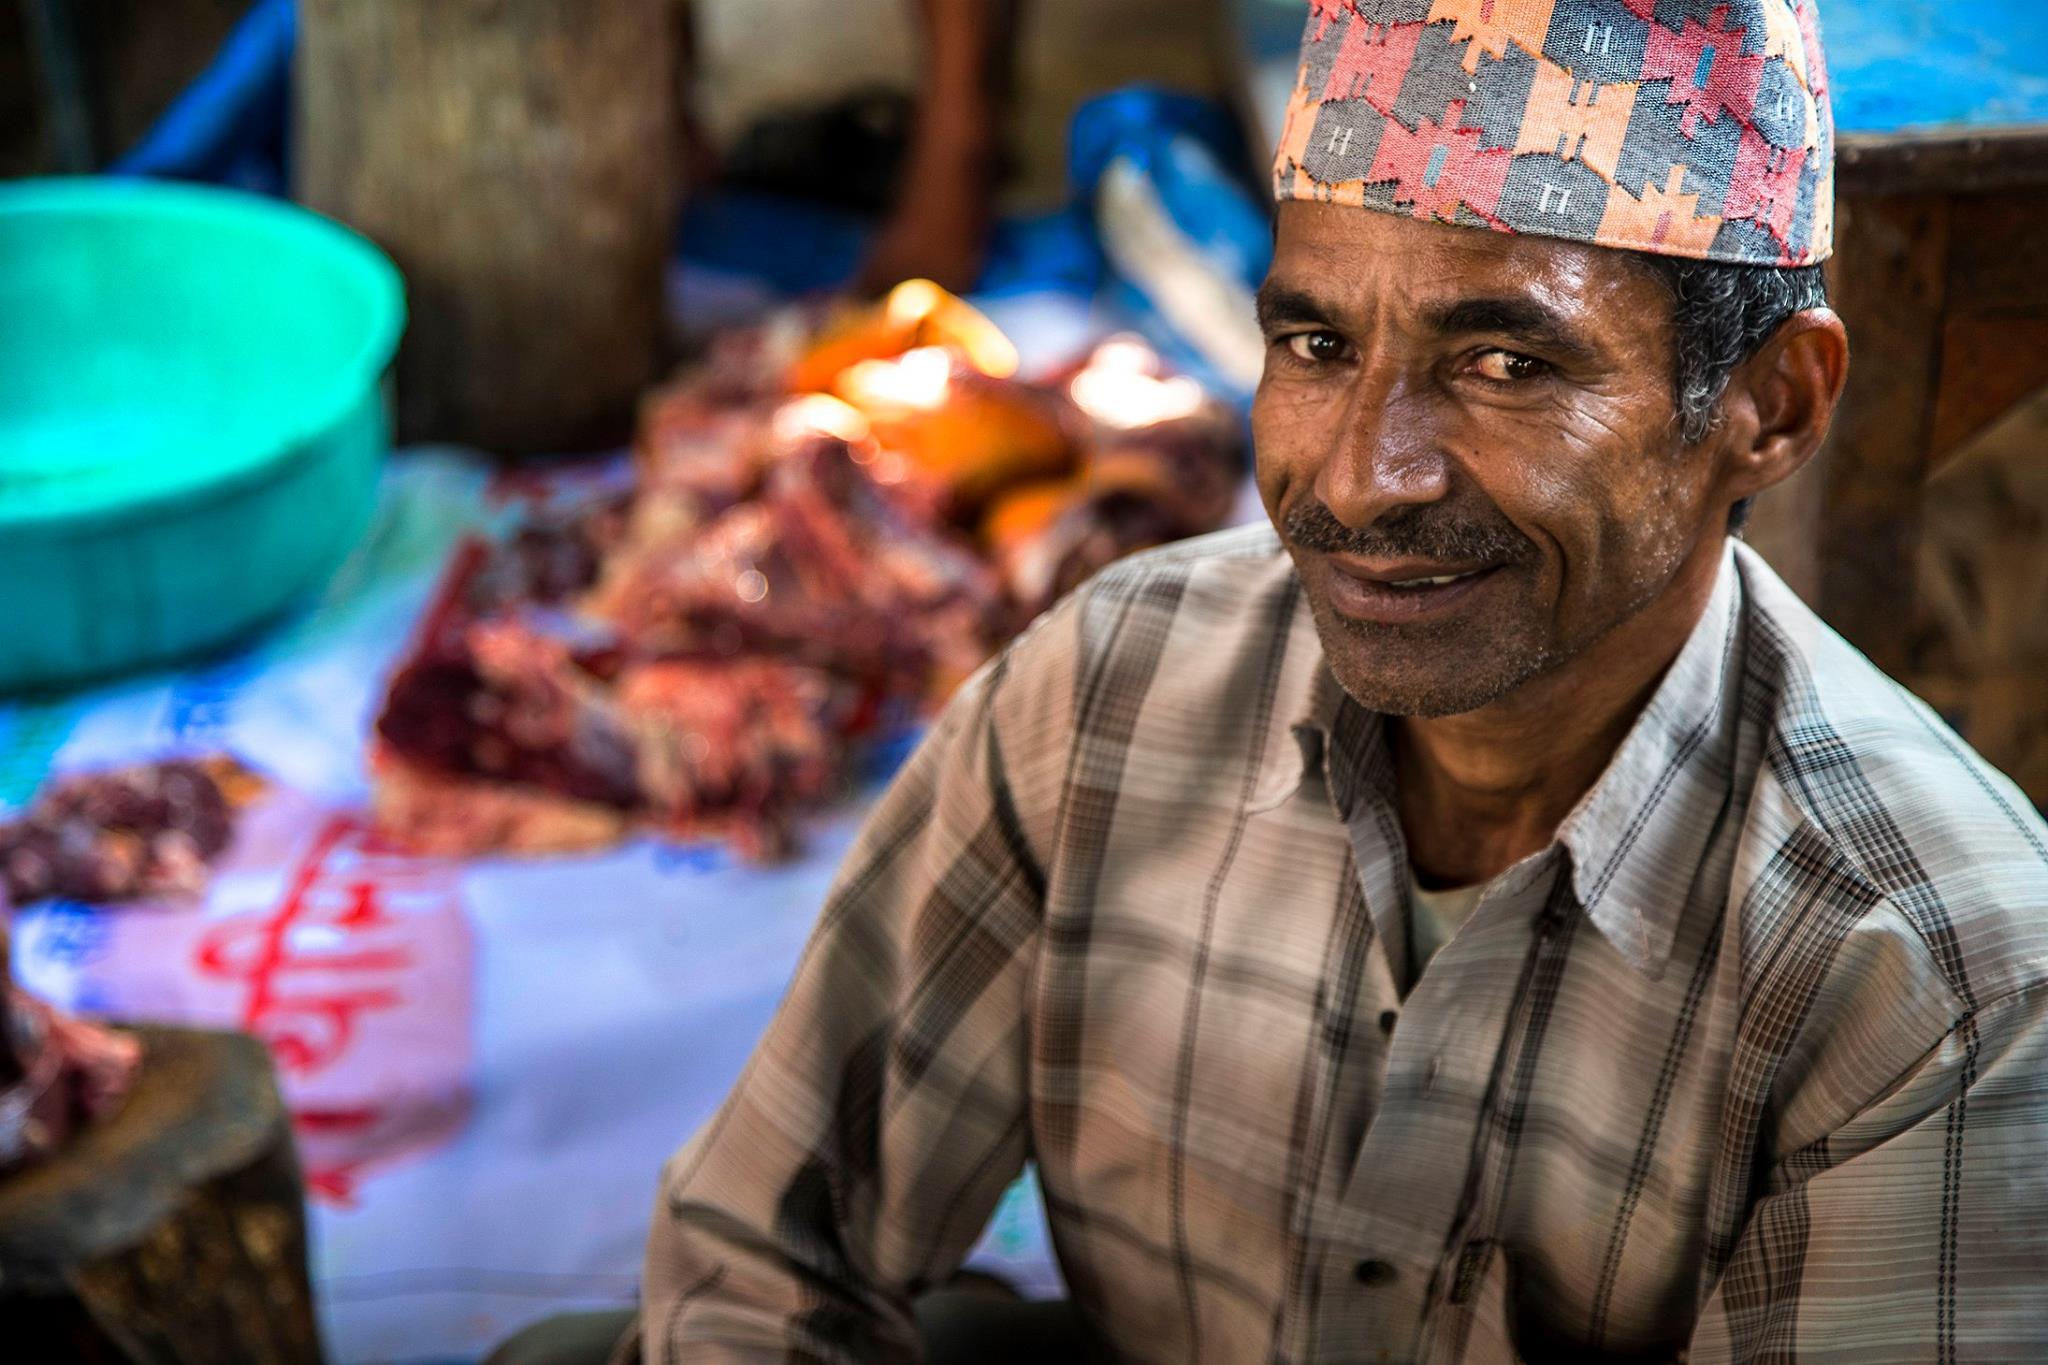 Simon+Needham+Humanitarian+Photography+Nepal+18.jpg